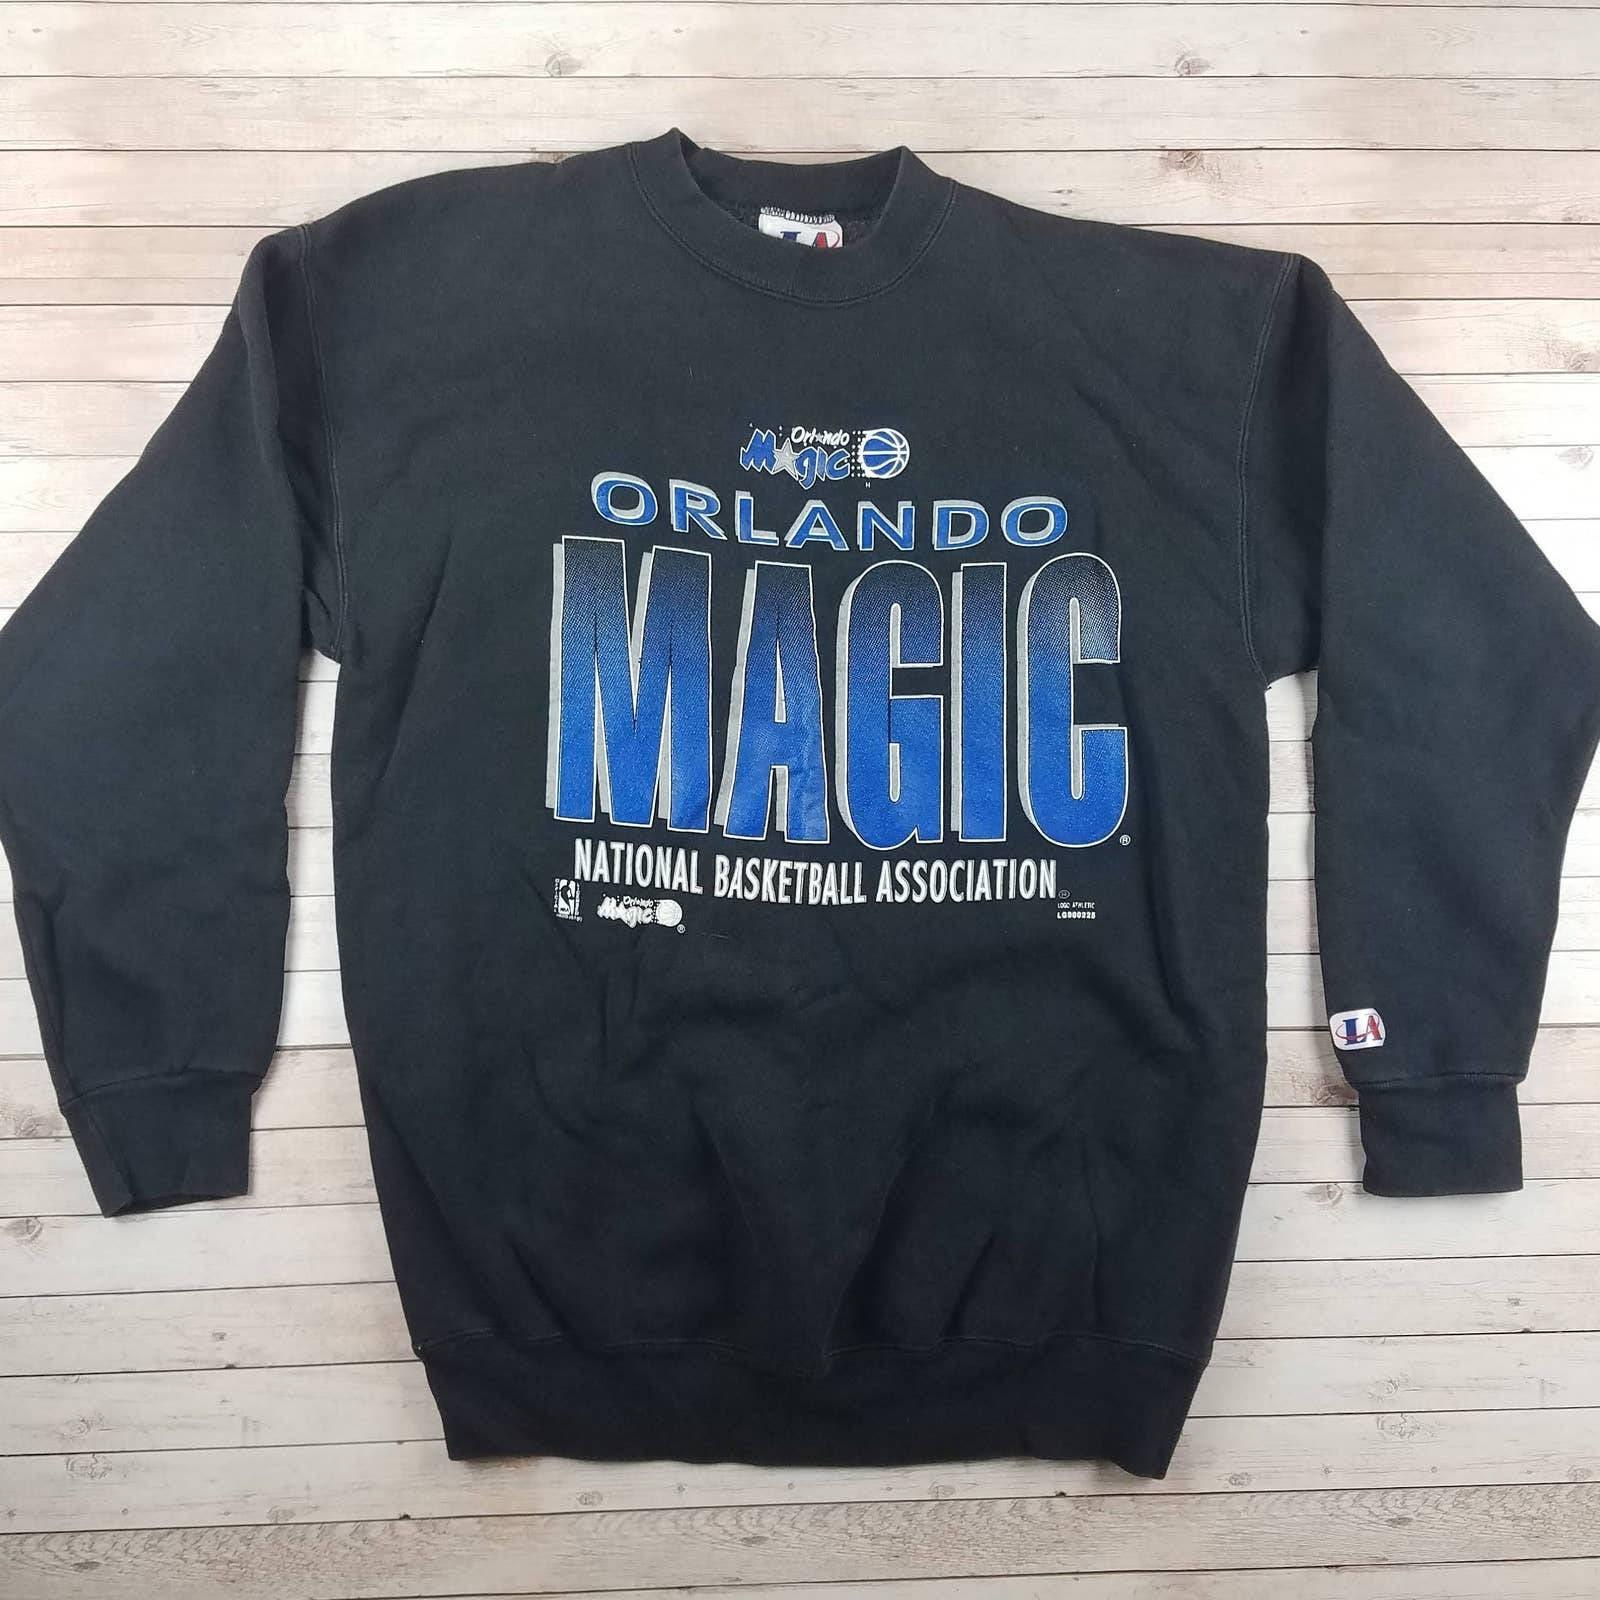 VTG 1990s Orlando Magic NBA Sweatshirt